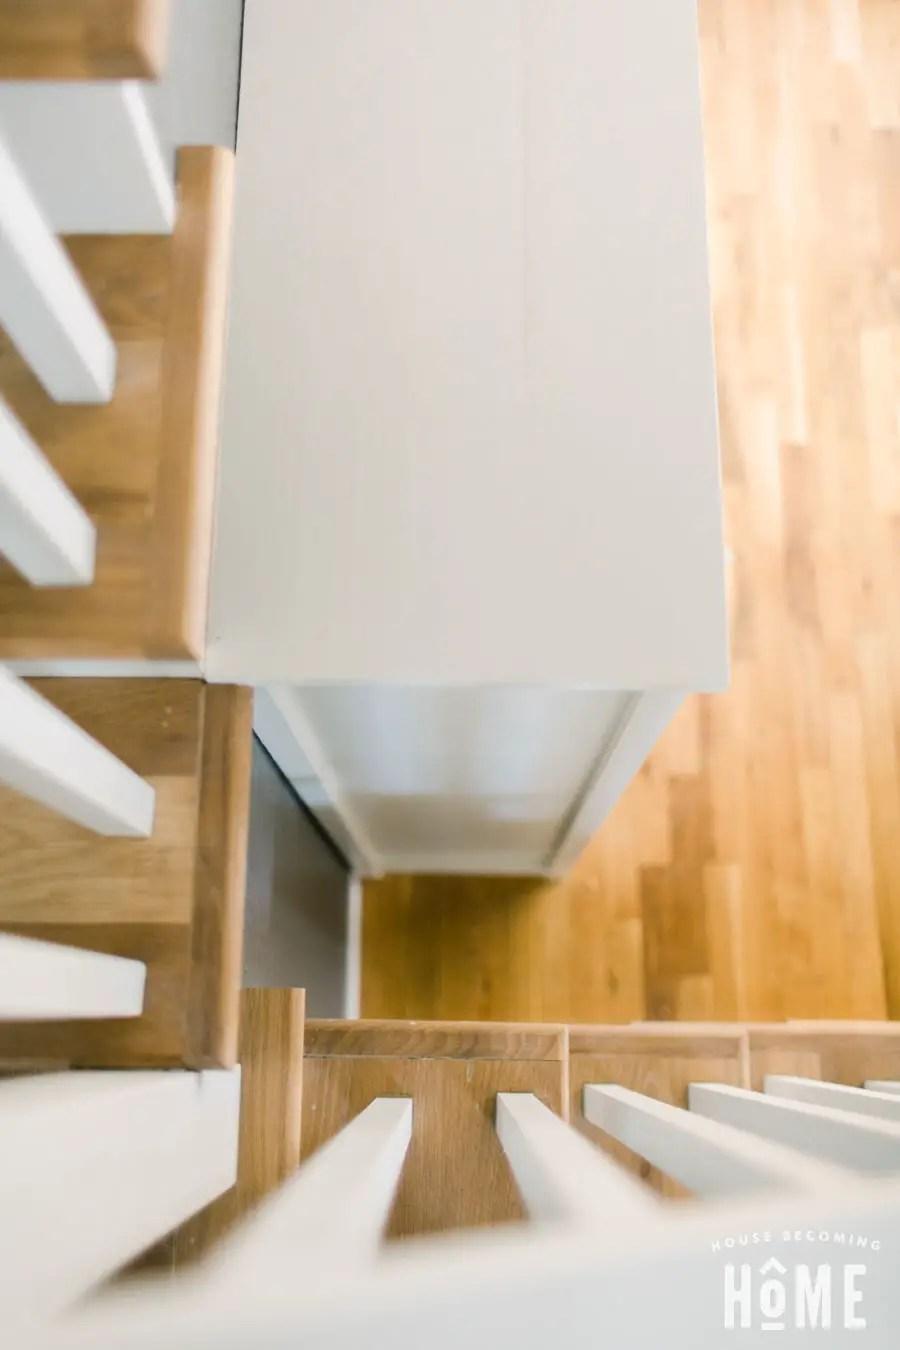 DIY Shoe Cabinet Top View